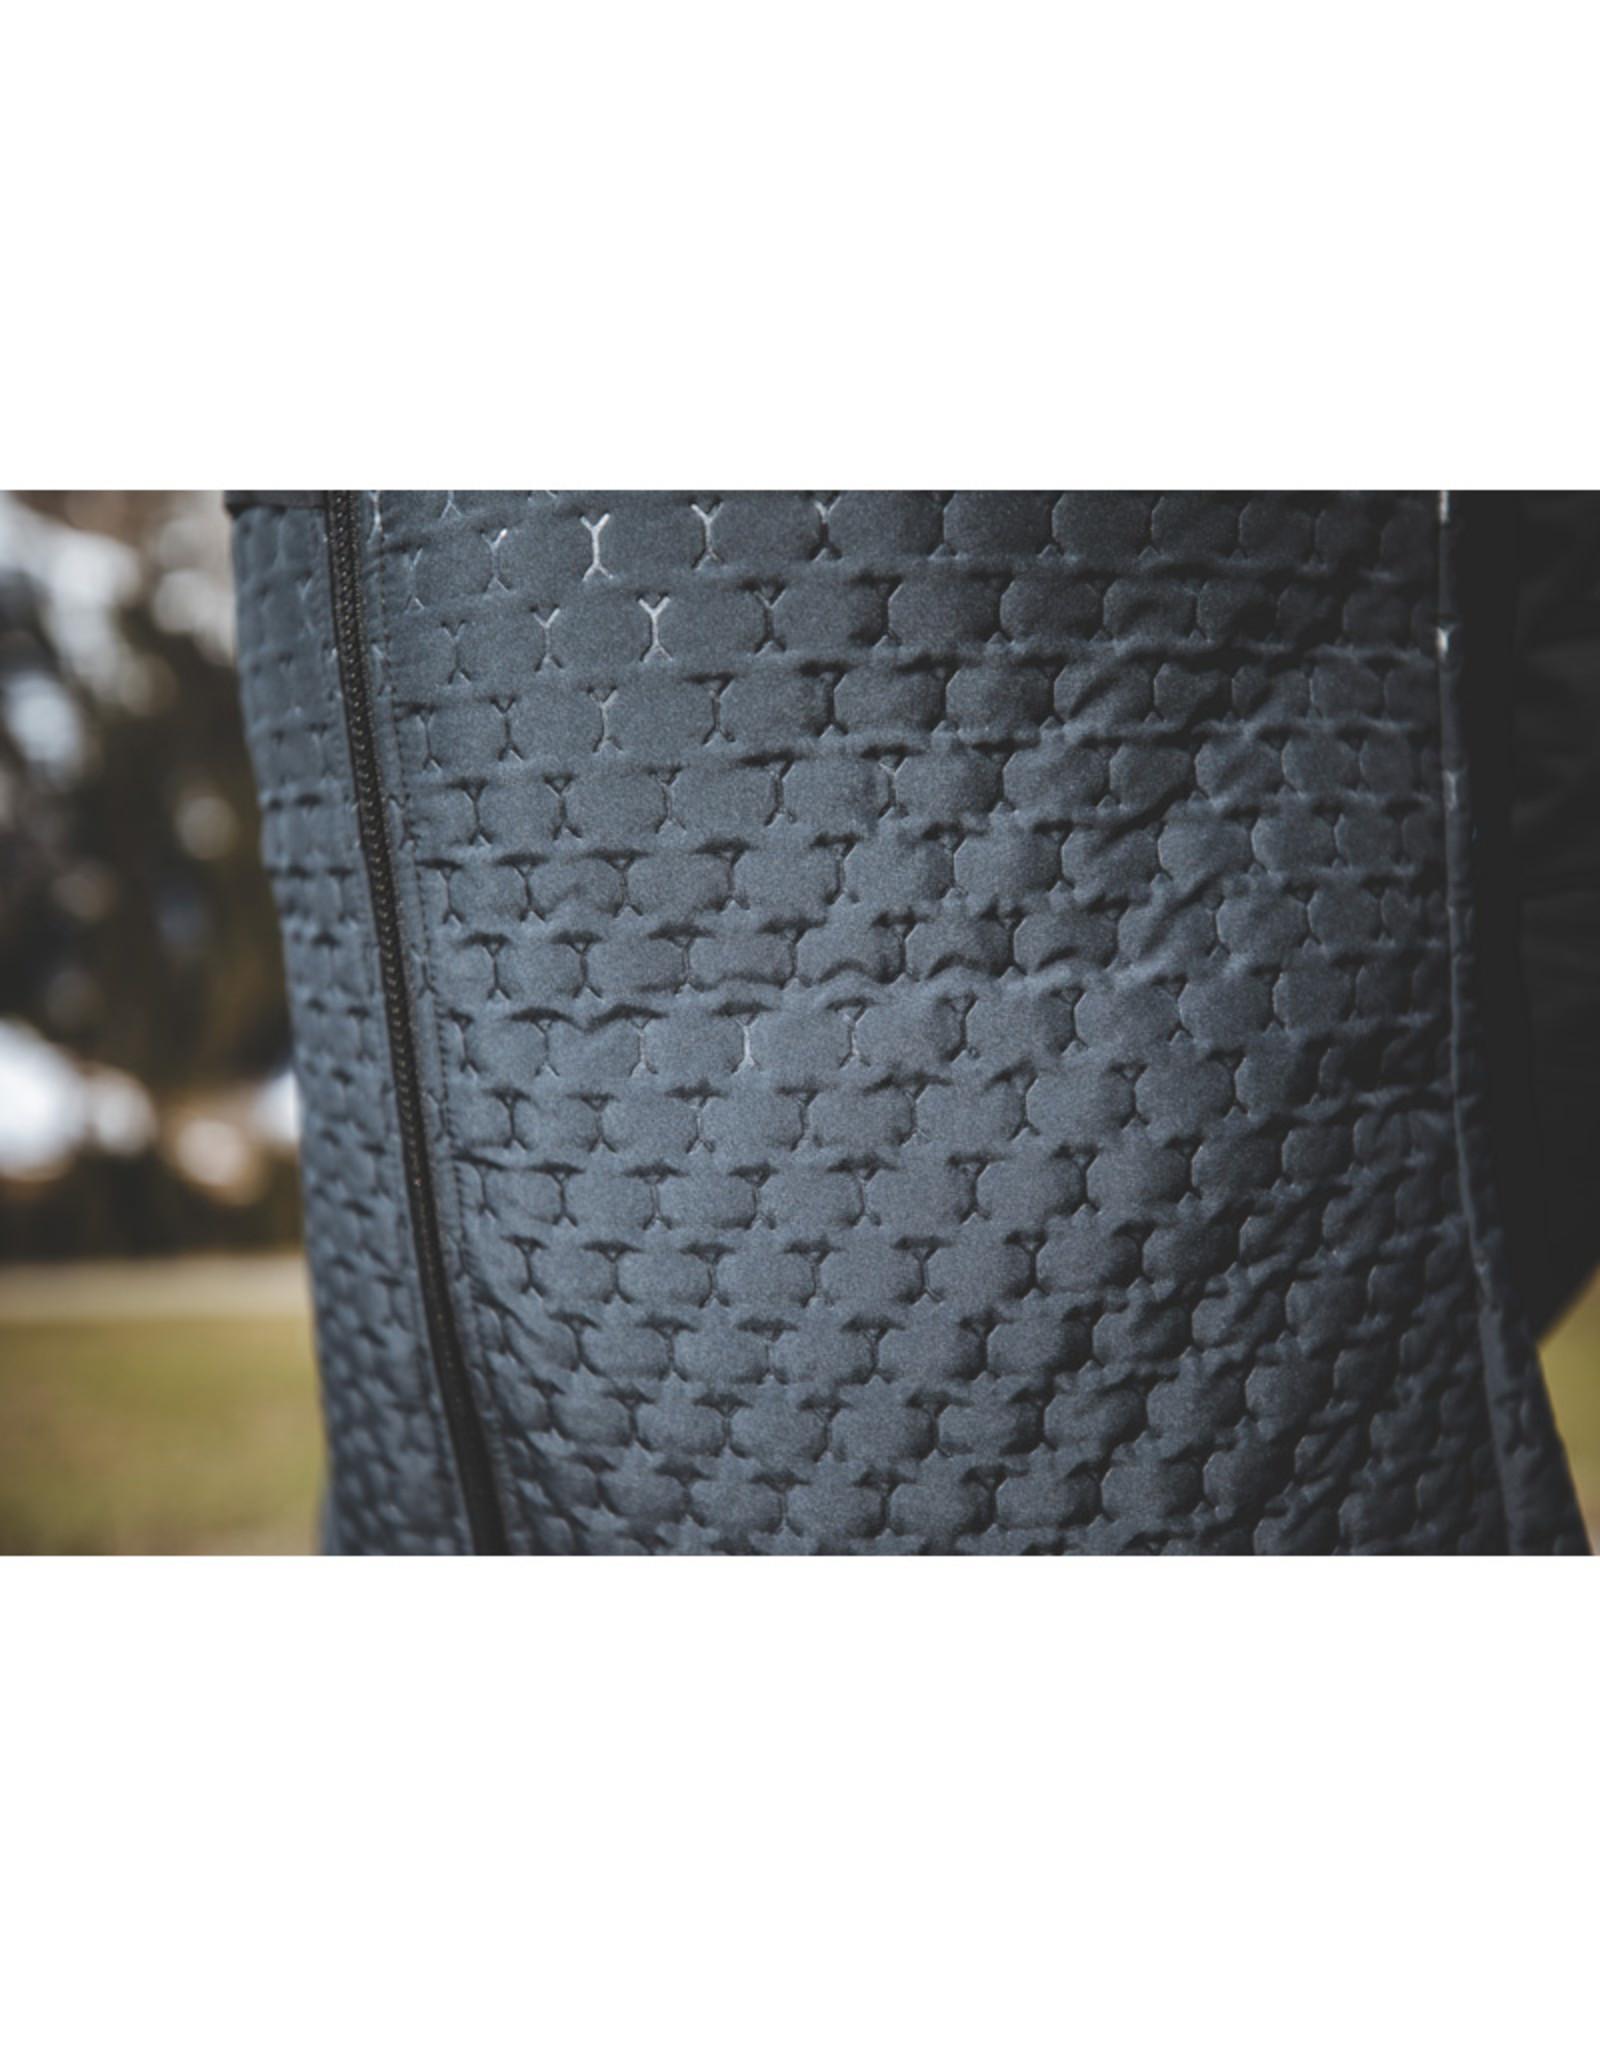 Compressport Winter Insulated 10/10 Jacket Noir Veste de course imperméable